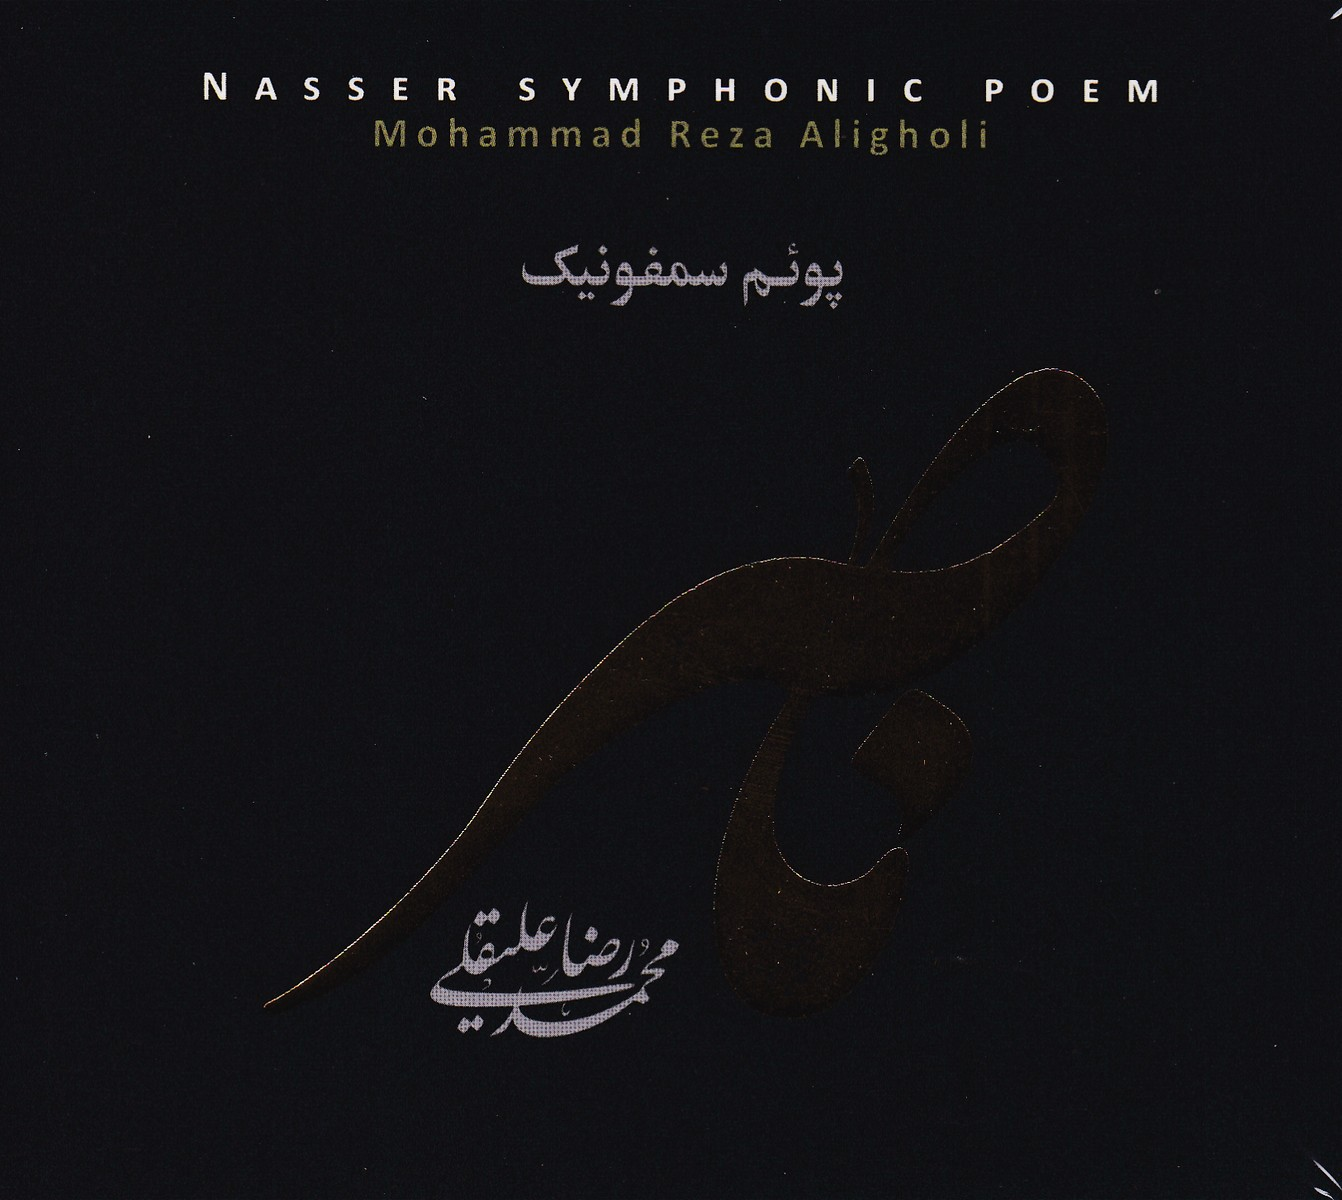 پوئم سمفونیک ناصر